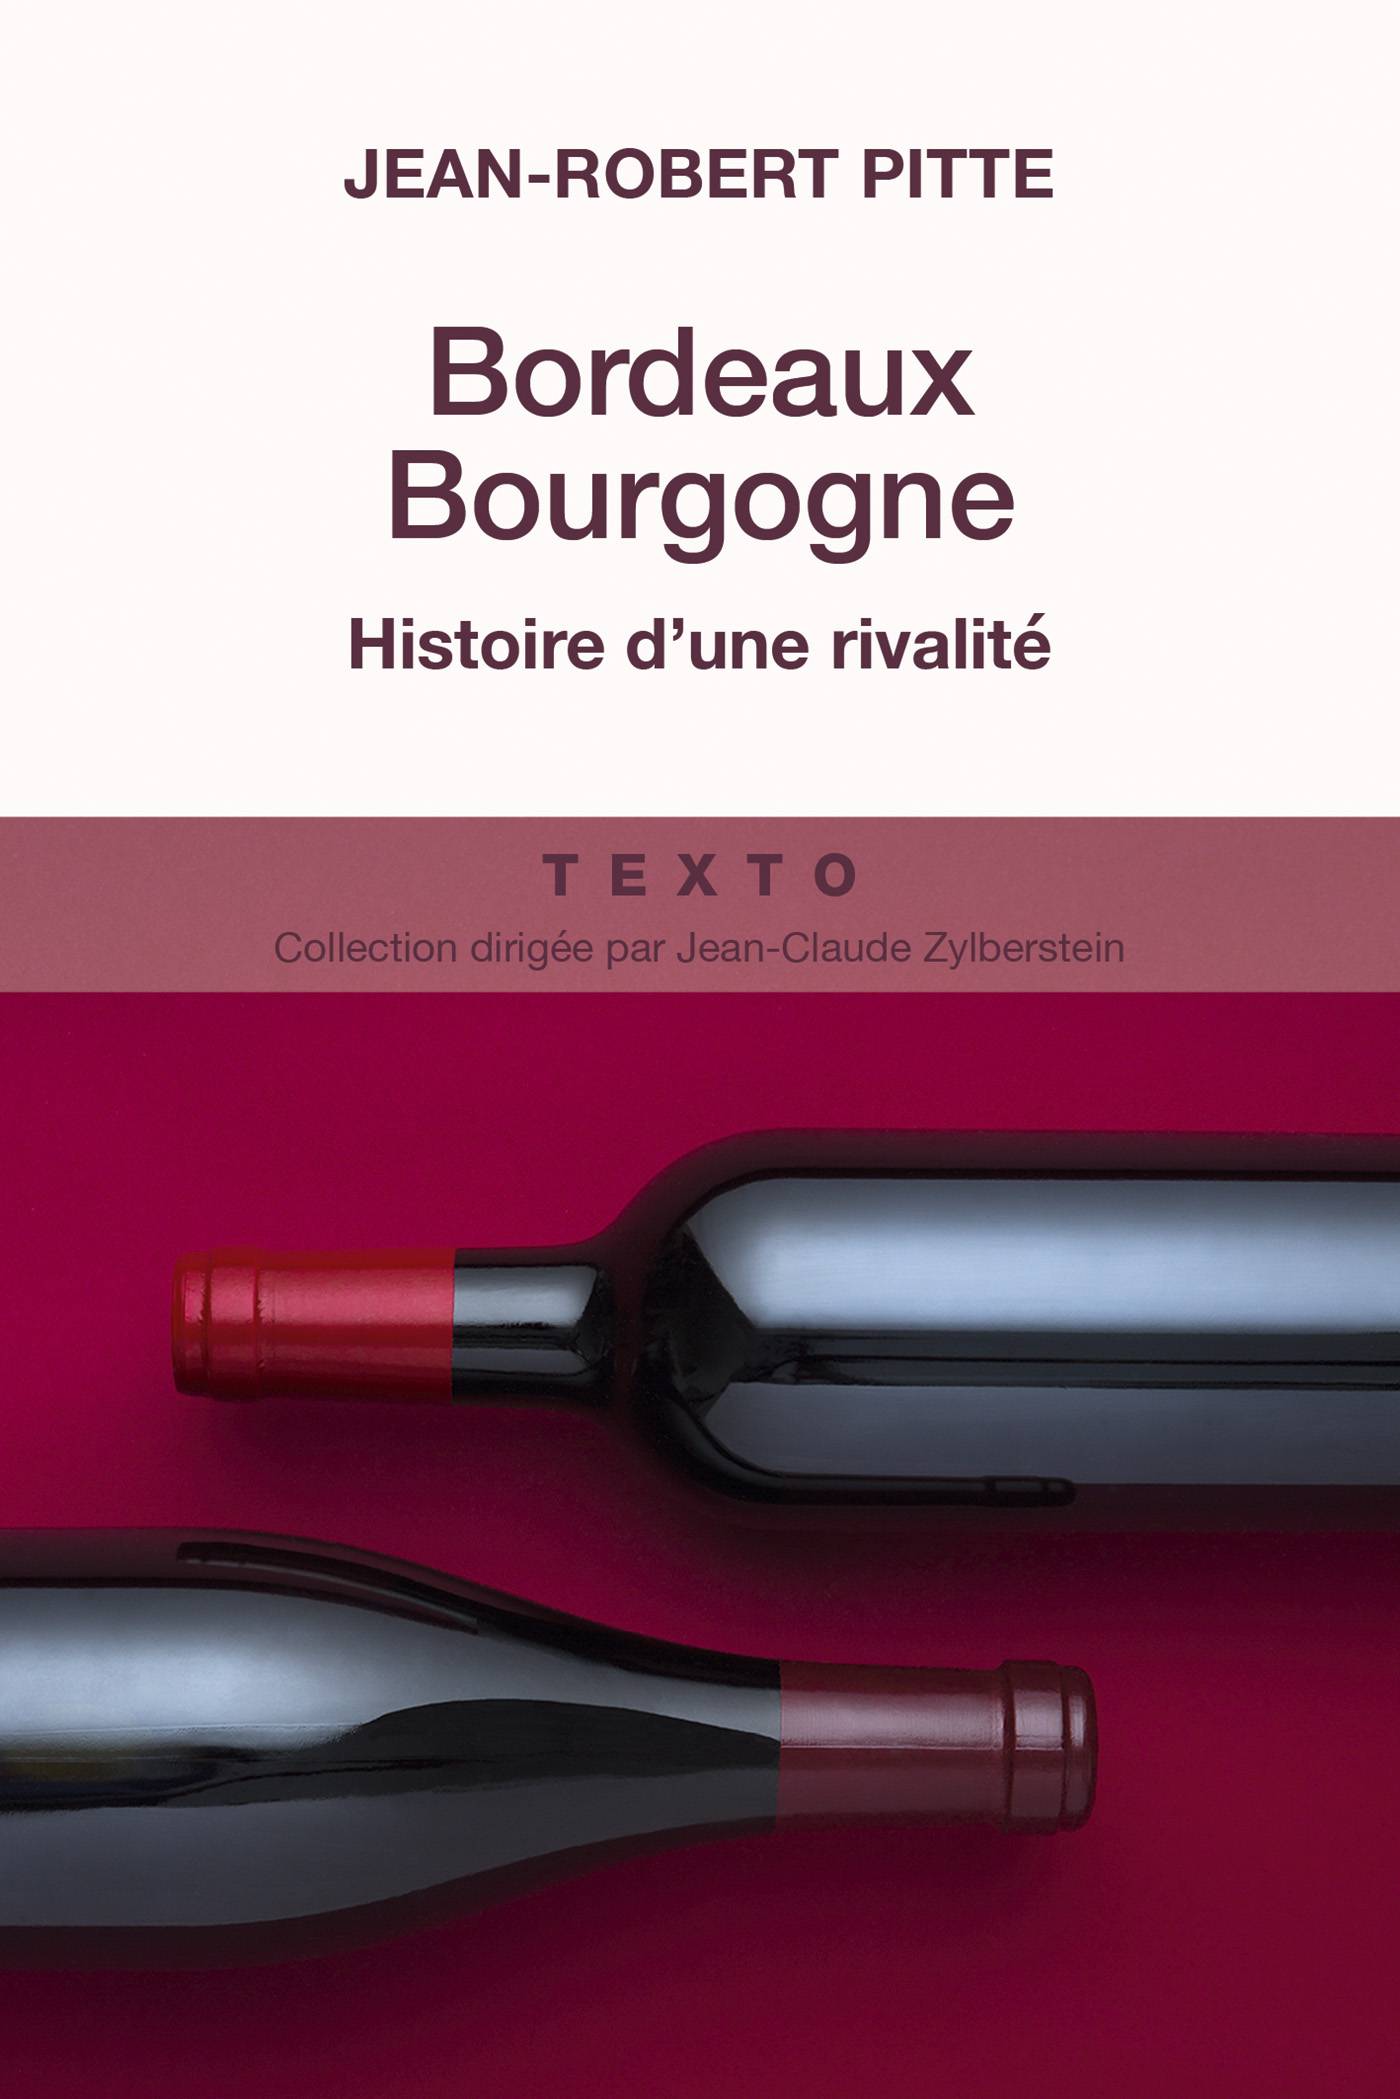 Bordeaux Bourgogne